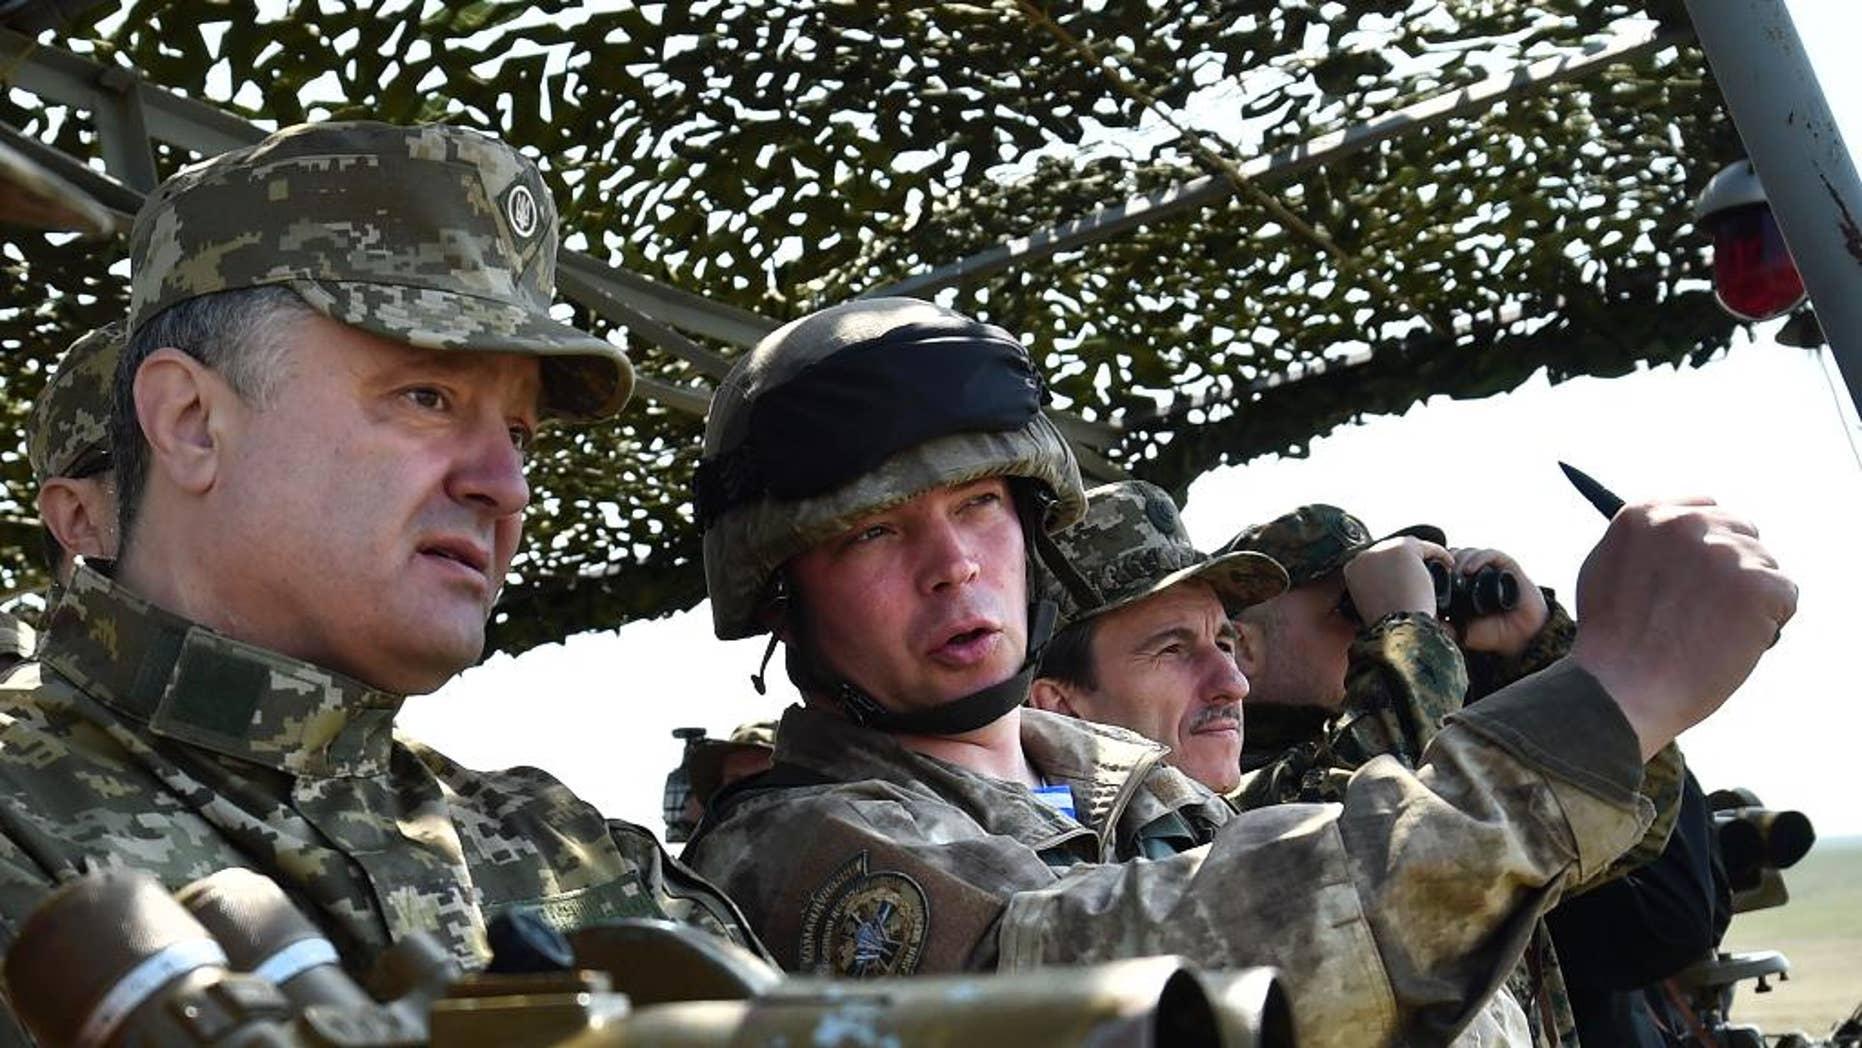 April 25, 2015: Ukrainian President Petro Poroshenko, left, watches a military exercise of the Ukrainian armed forces in Mykolaiv region, Ukraine.